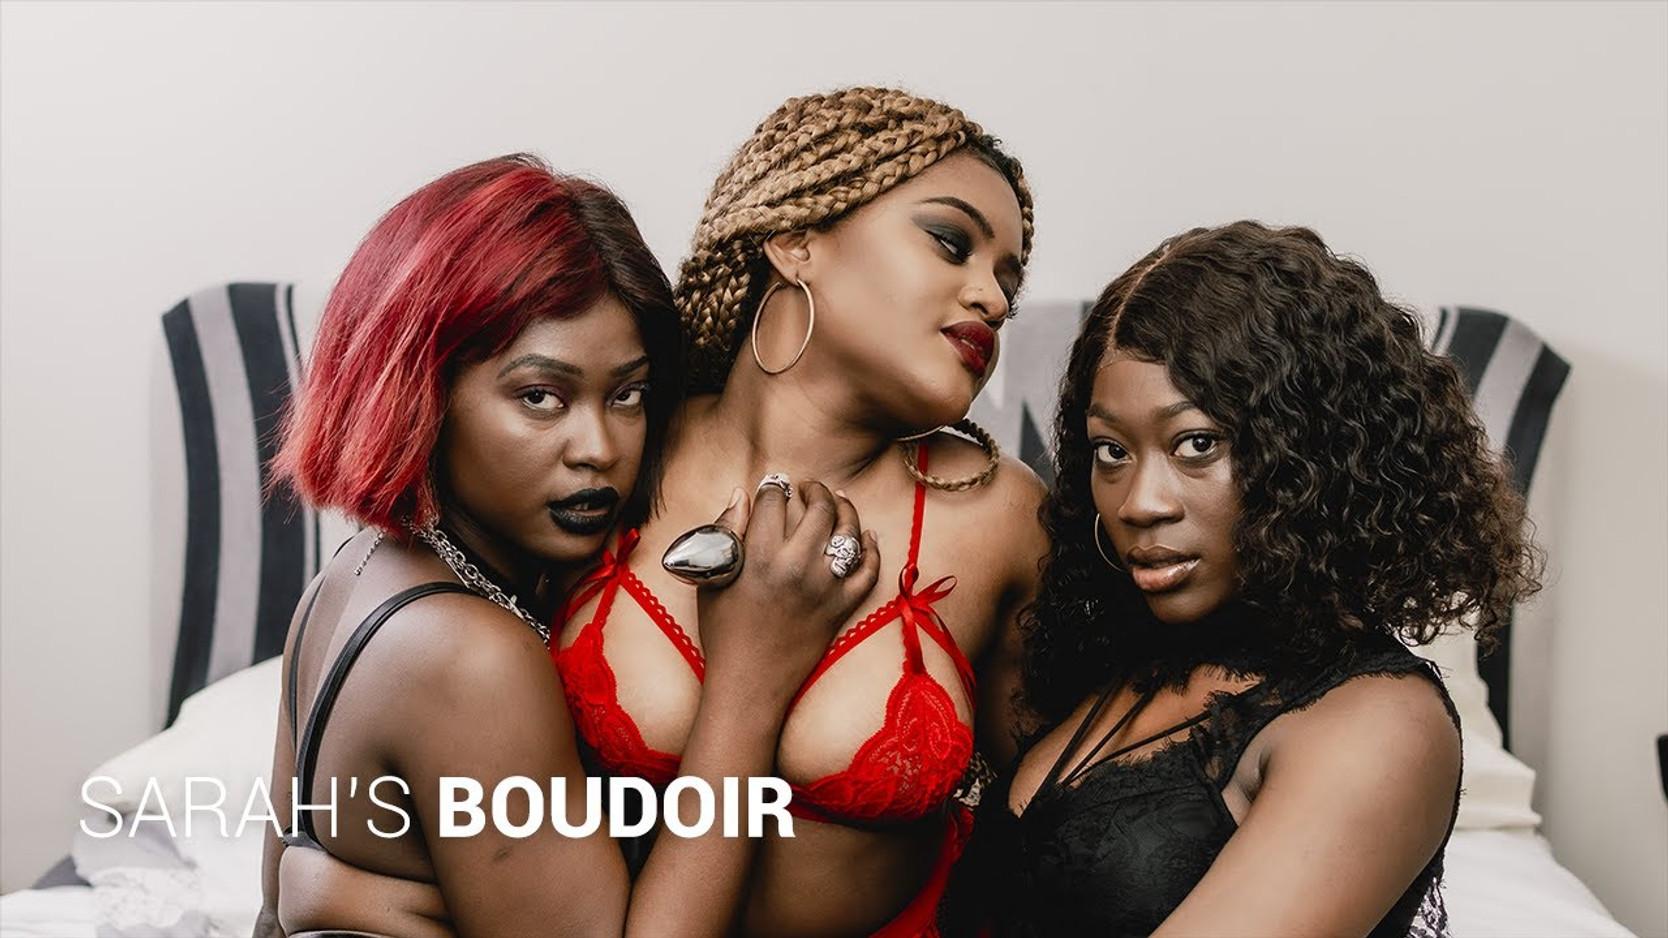 SARAH'S BOUDOIR - Photoshoot Bts (Lingerie line) Nudity 18+